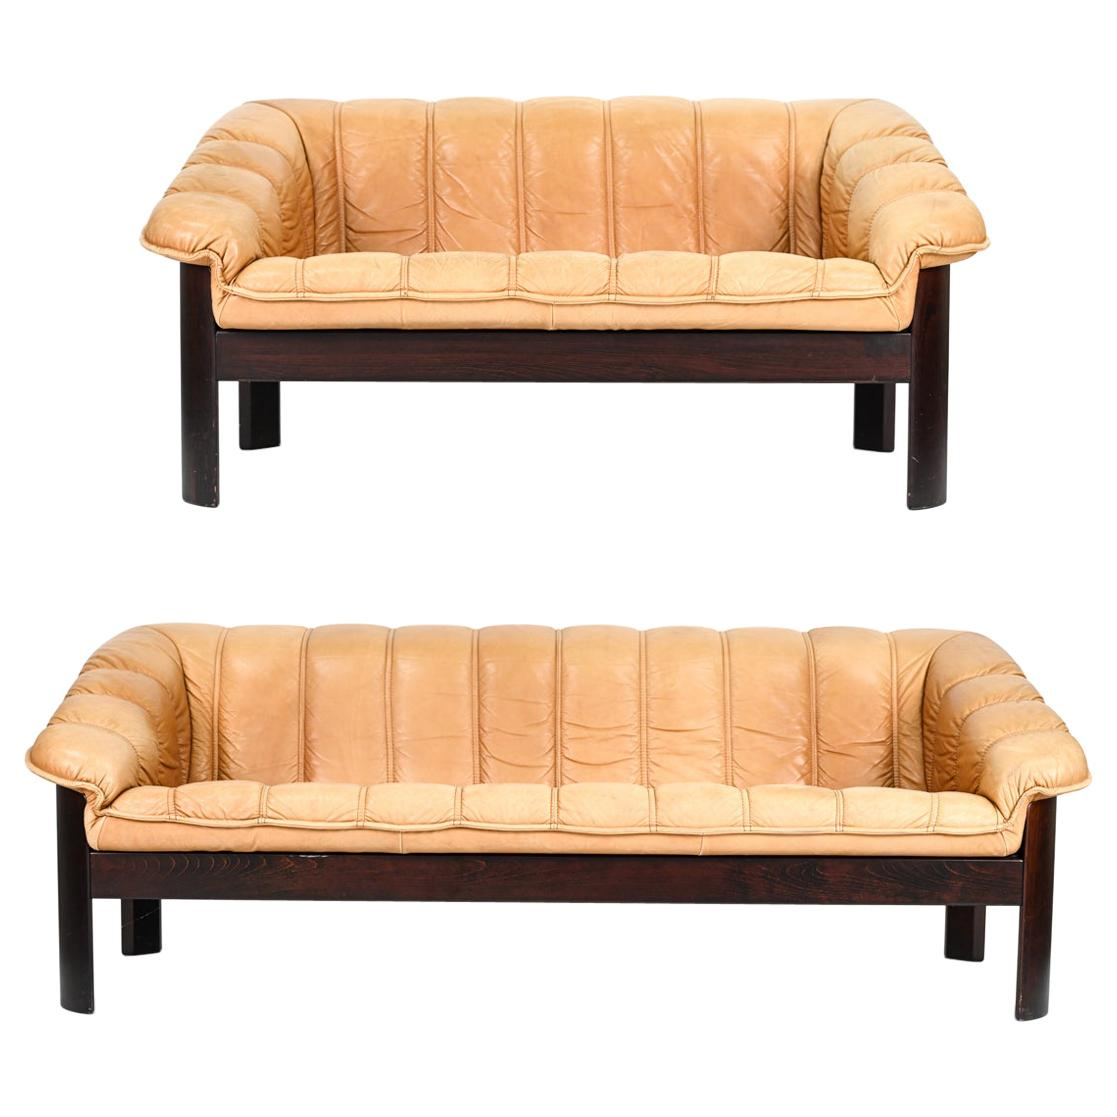 Ekorness Norway Mid-Century Sofa & Loveseat in Brandy Leather